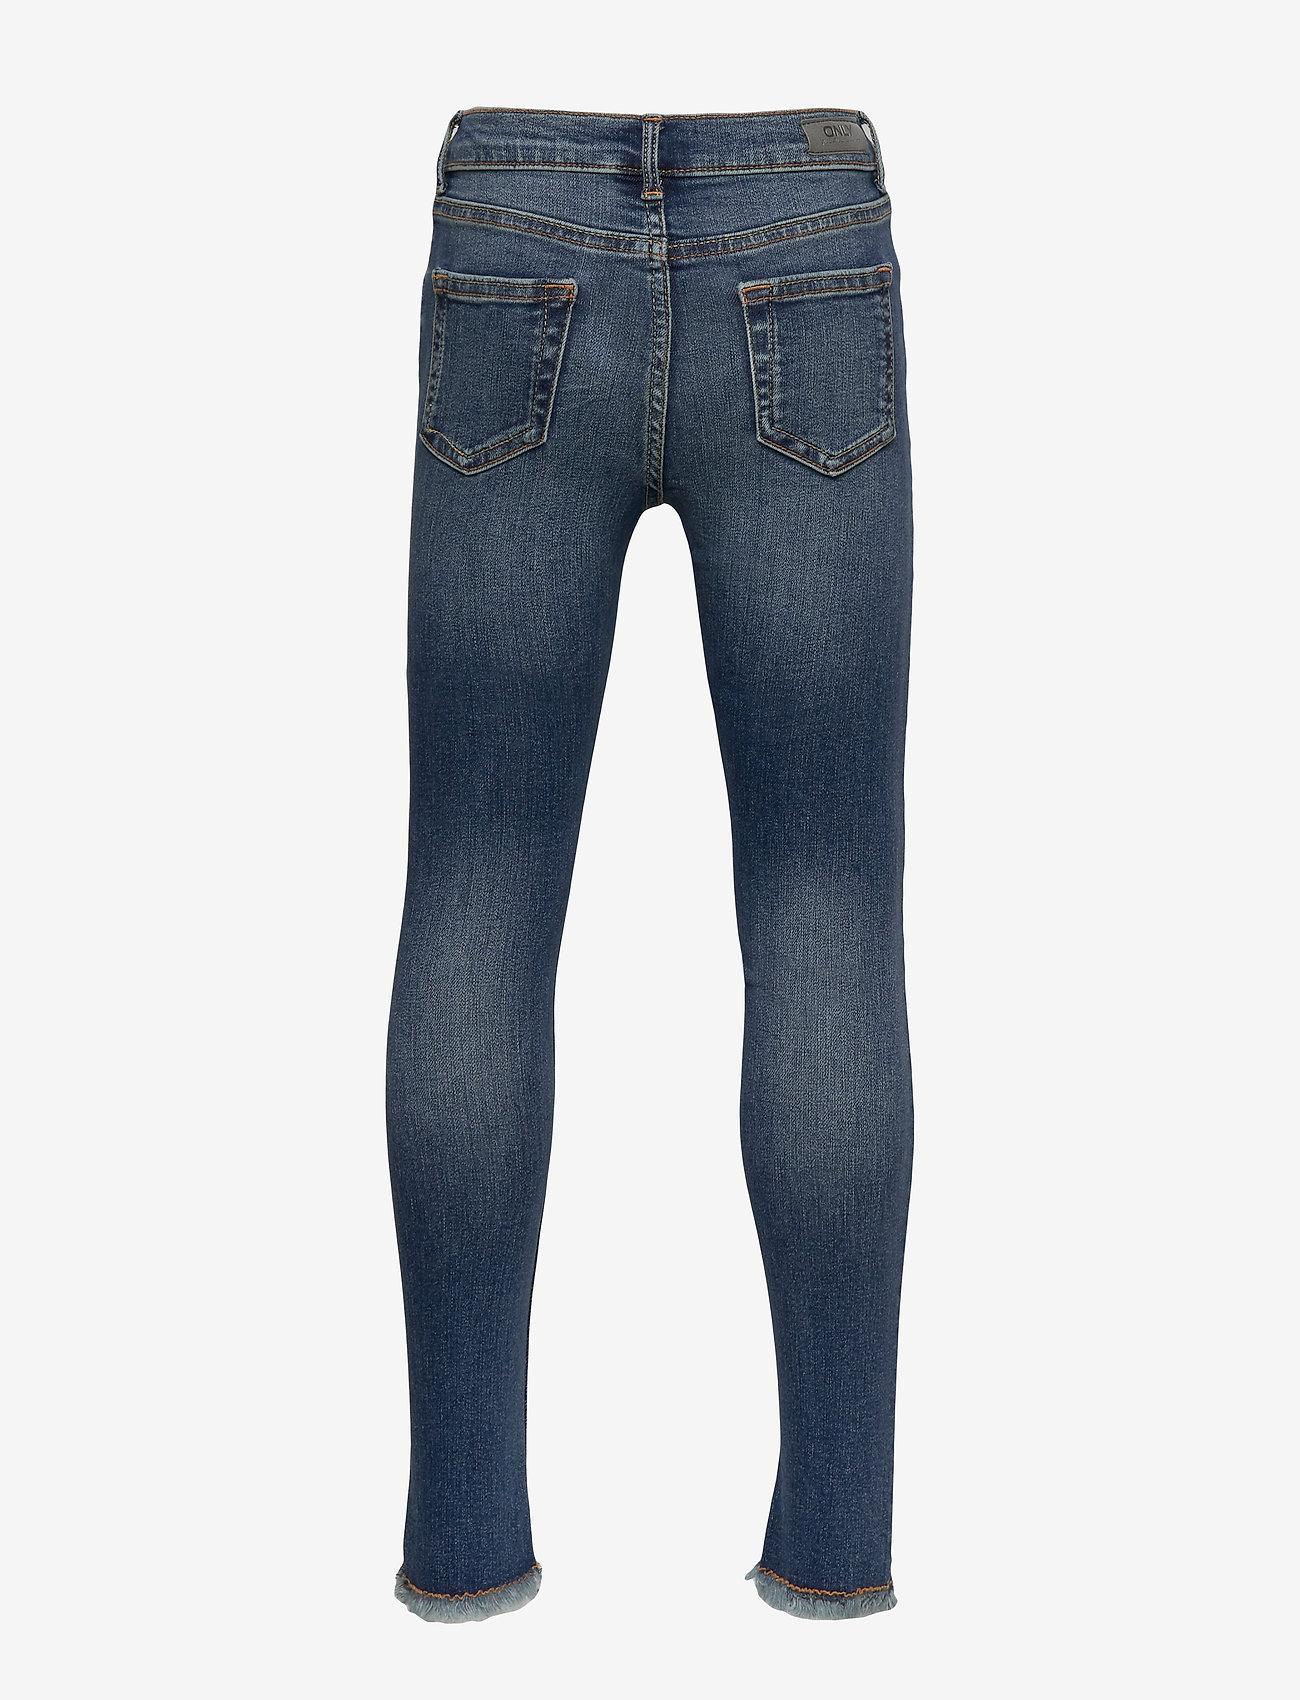 Kids Only - KONBLUSH SKINNY RAW JEANS 1303 NOOS - jeans - medium blue denim - 1